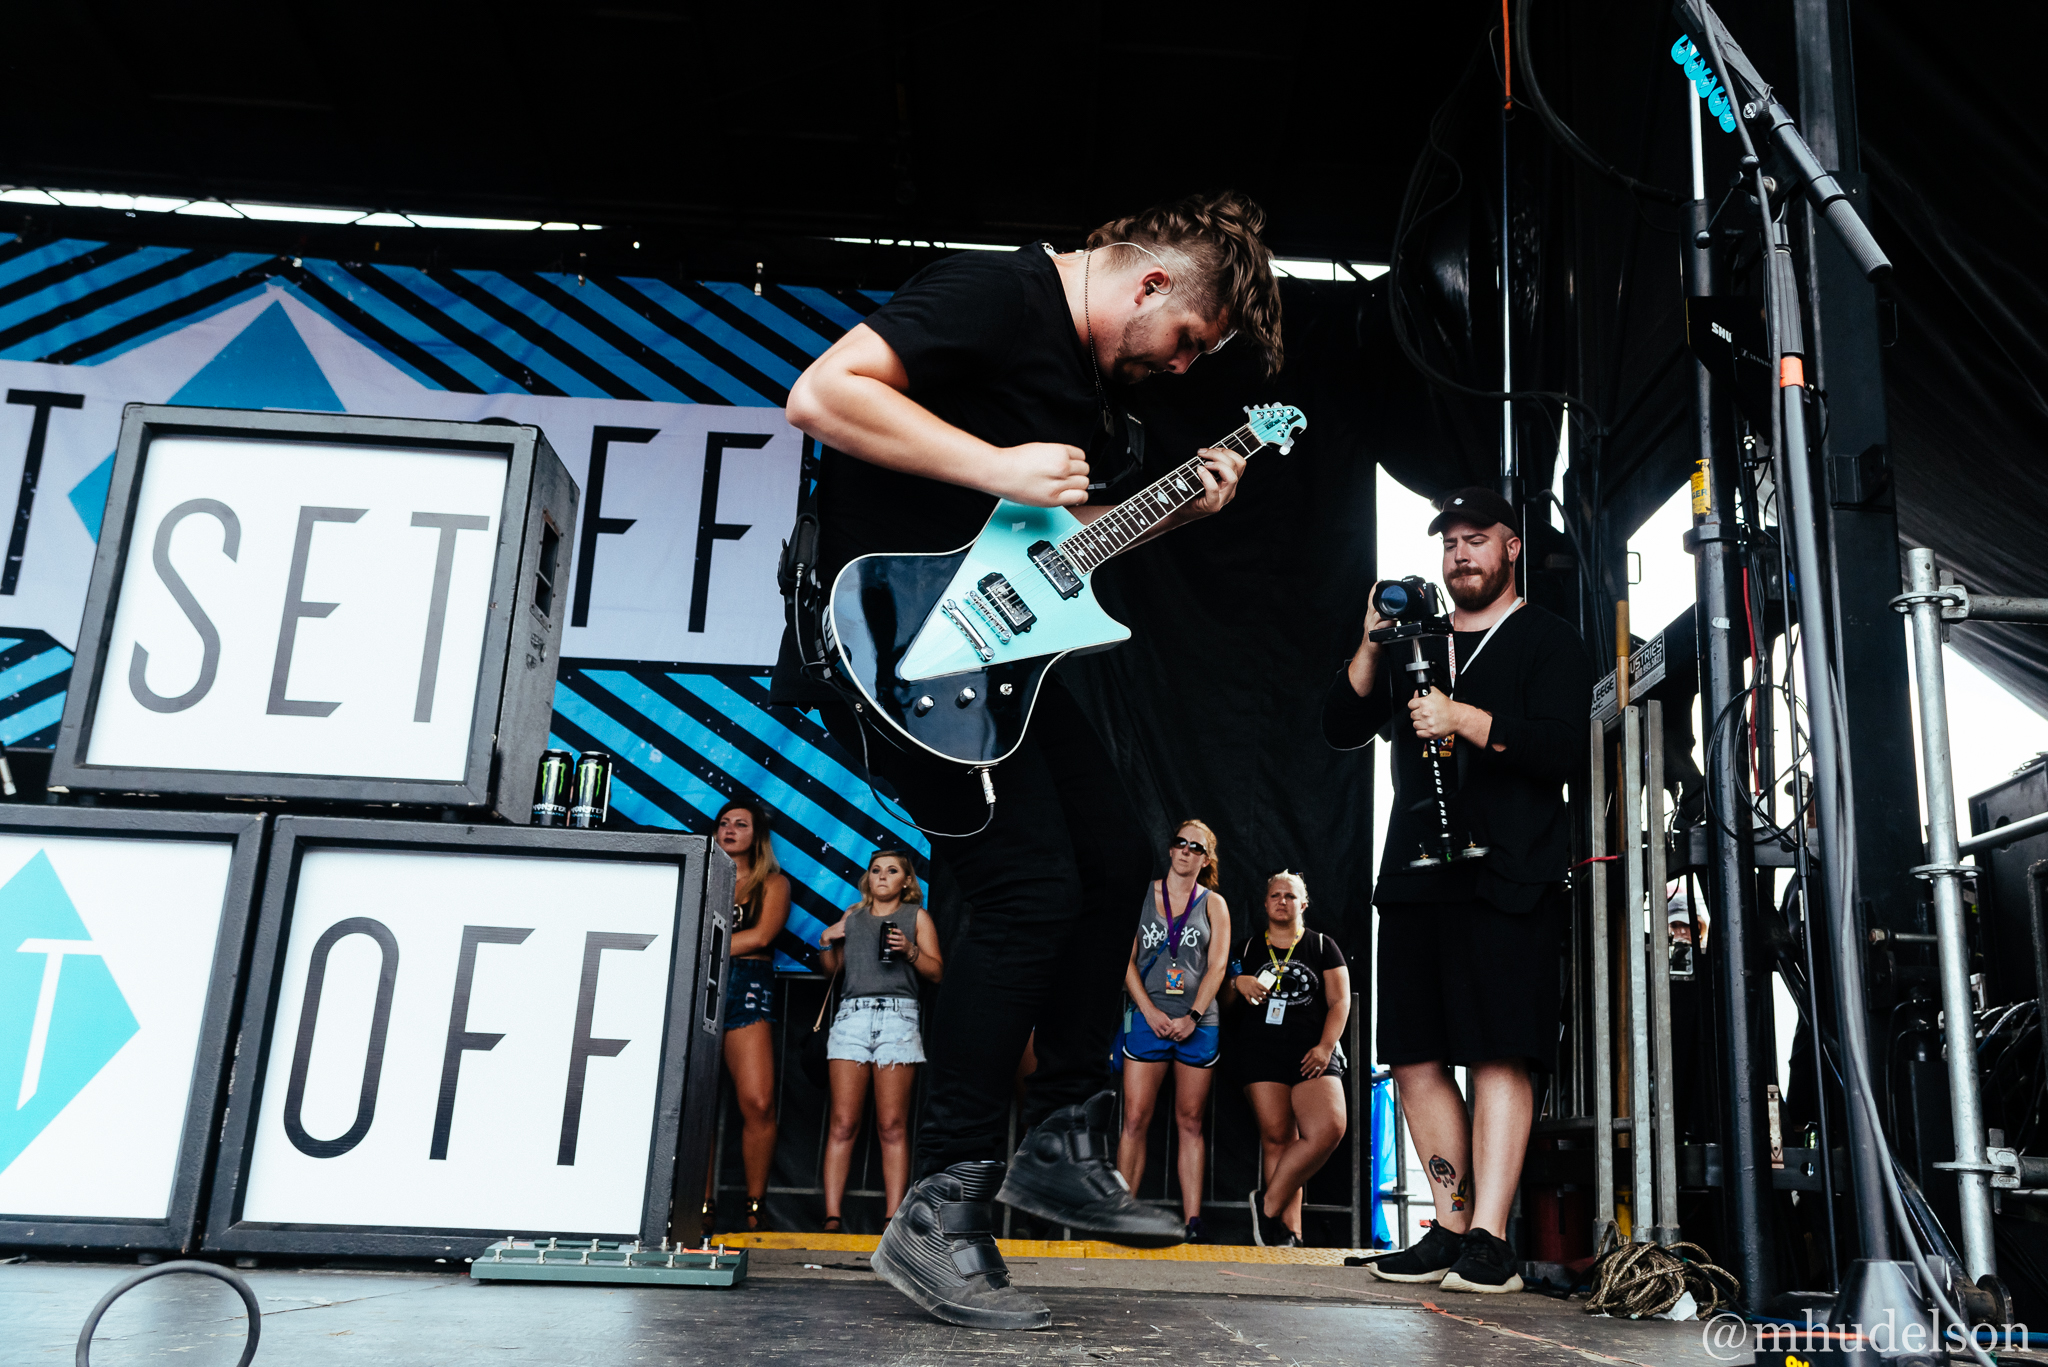 Set It Off / 7/19/16 / Vans Warped Tour / Noblesville, IN